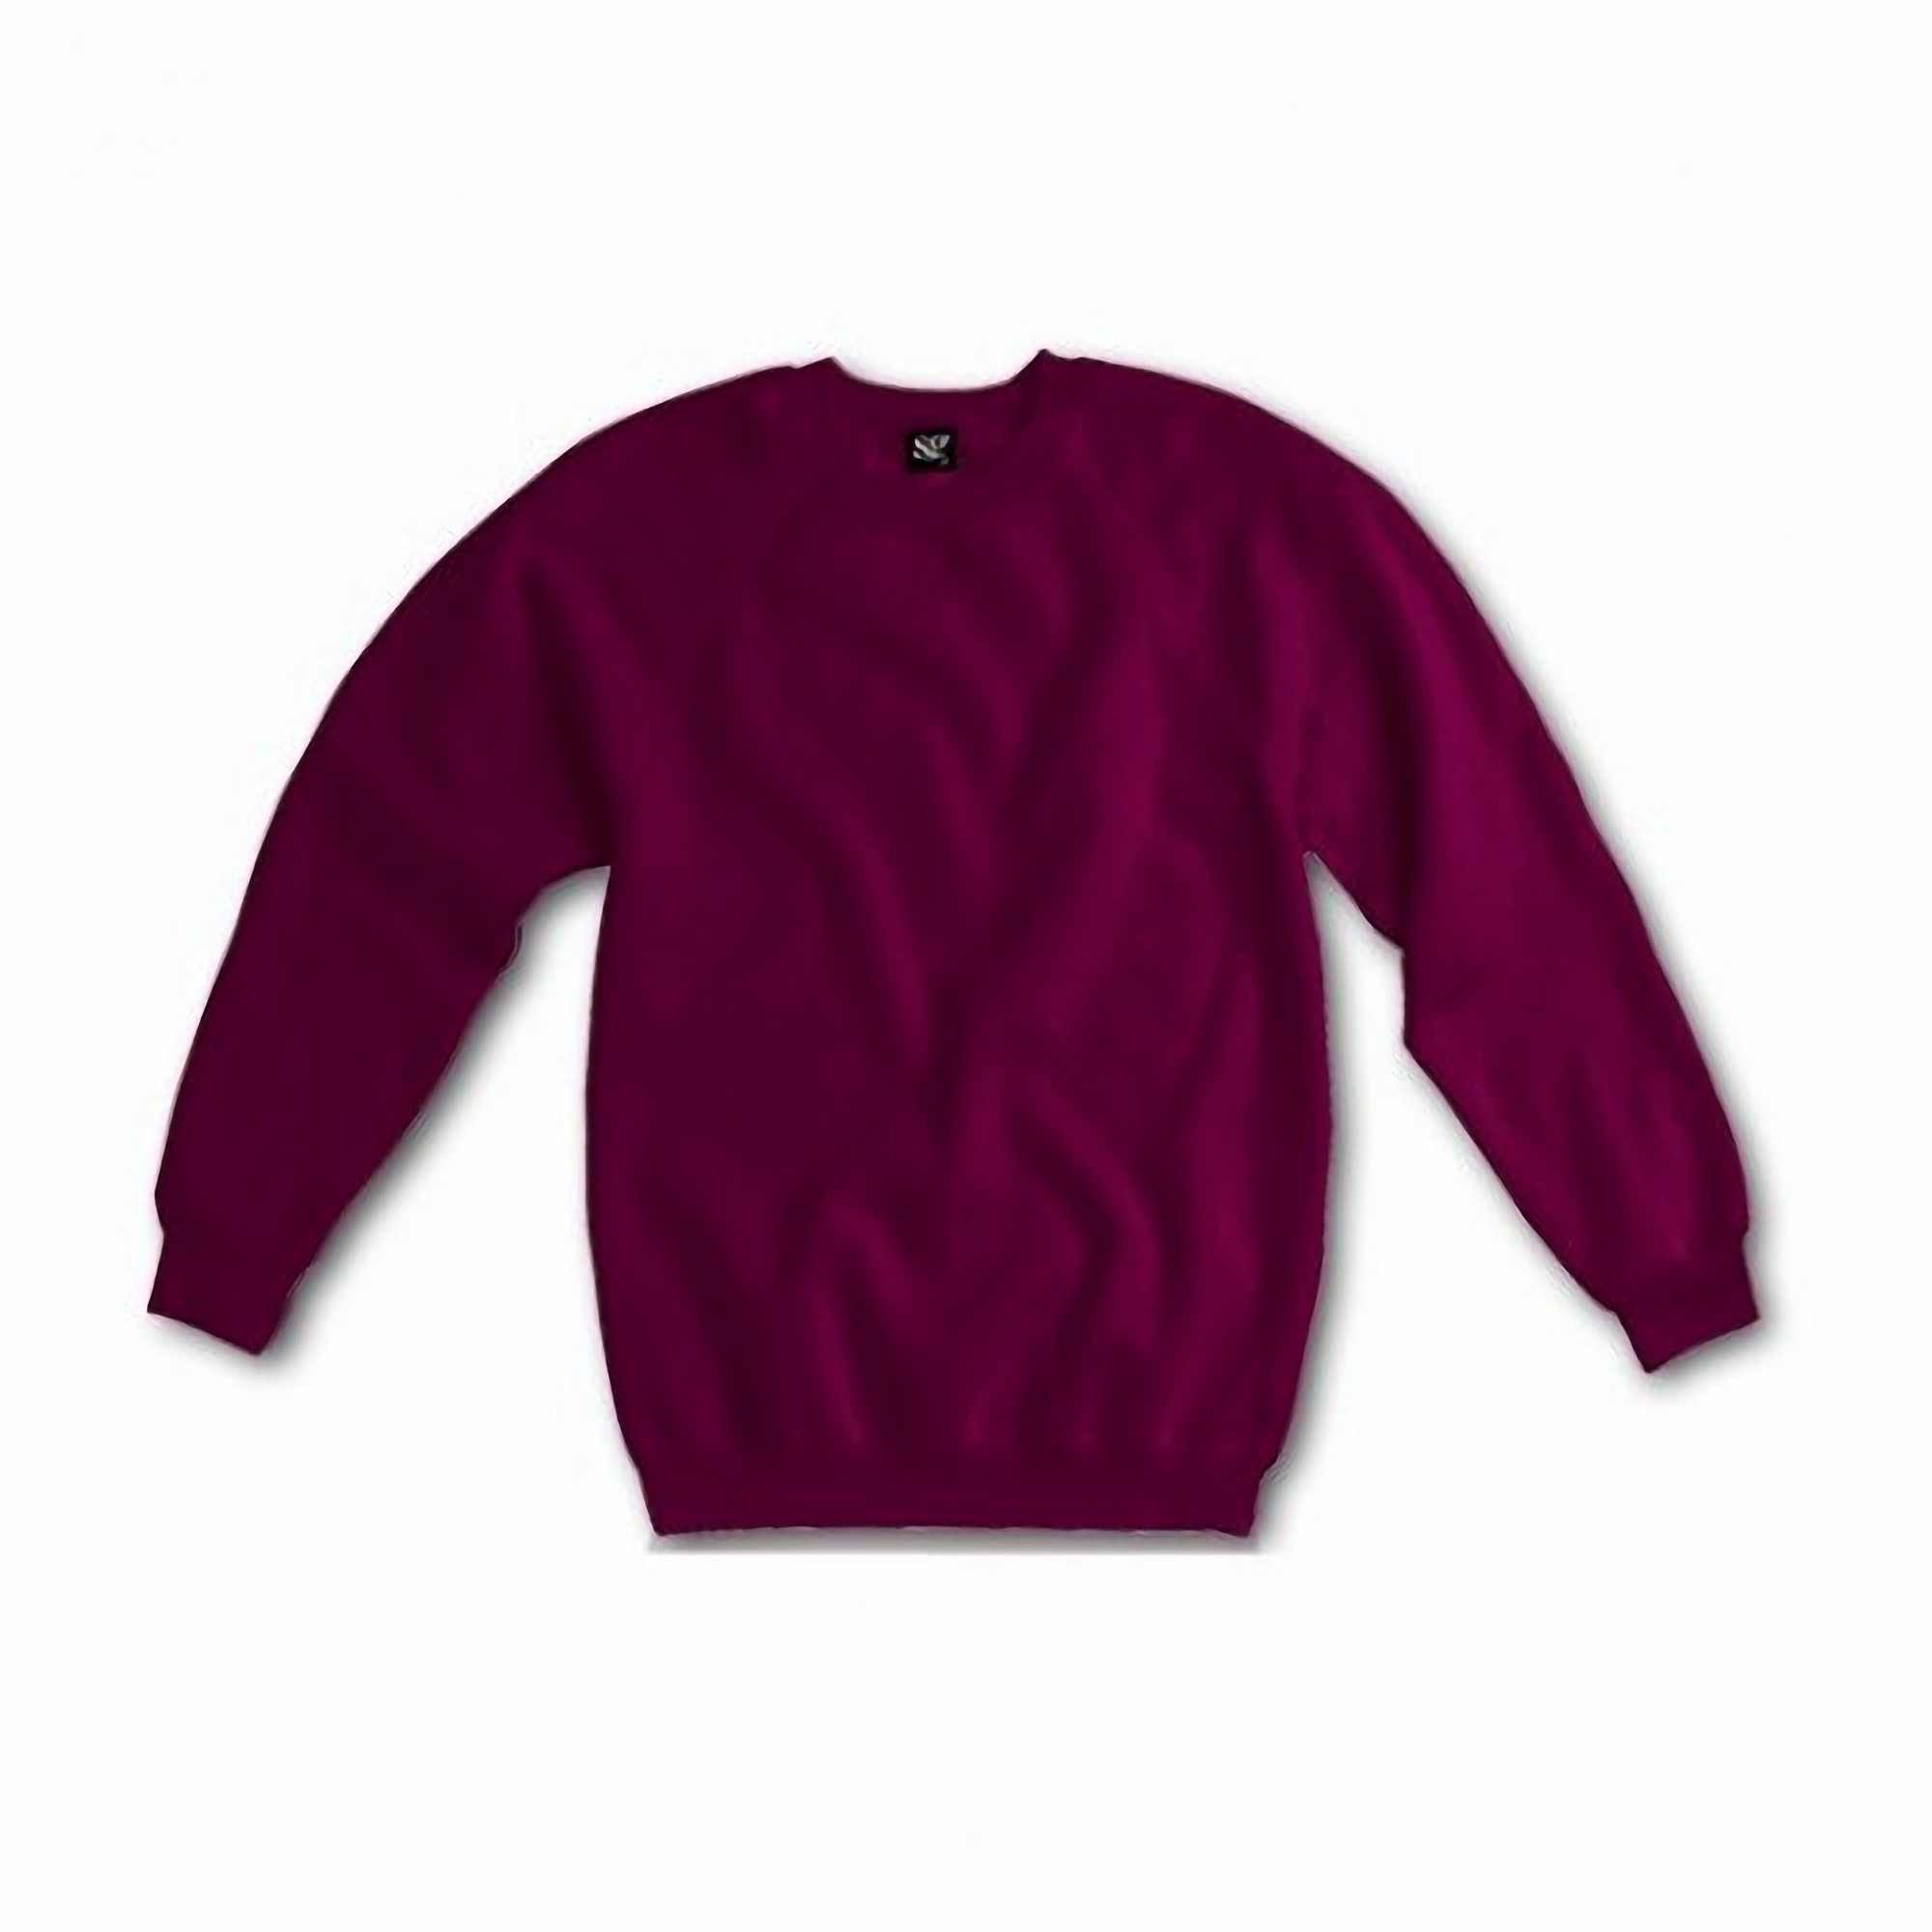 SG Ladies//Womens Raglan Sleeve Crew Neck Sweatshirt BC1070